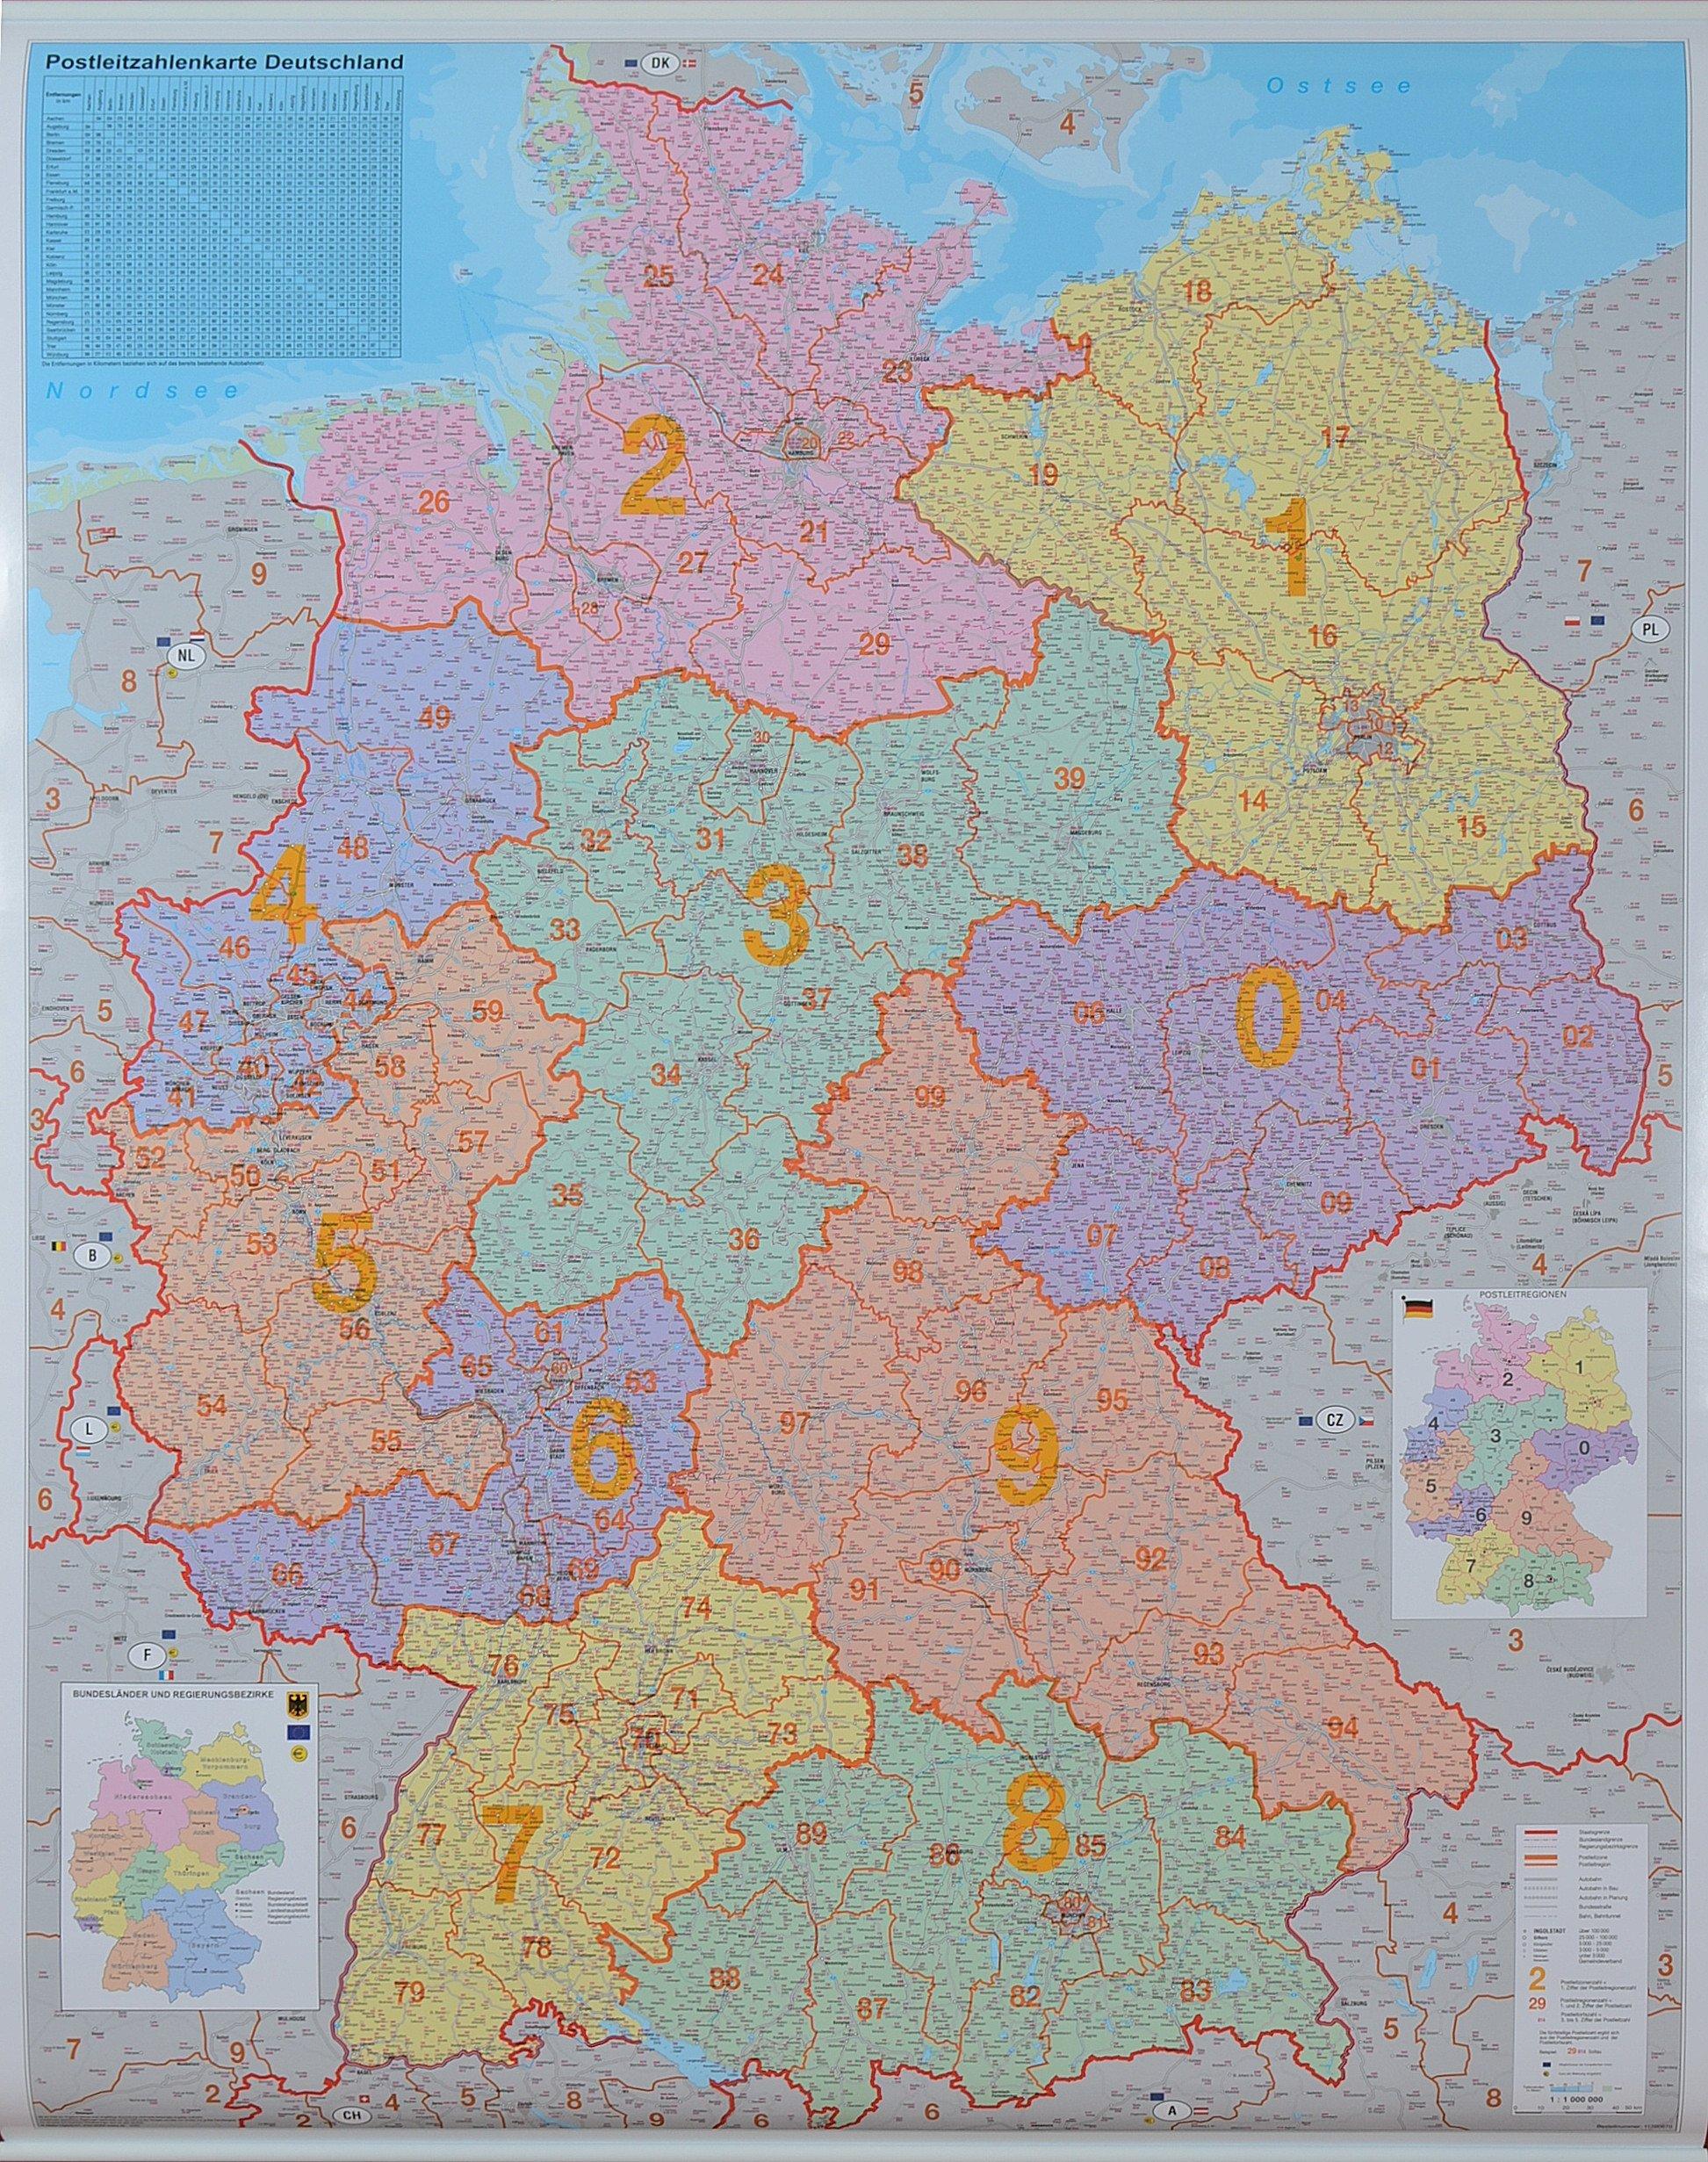 Bawaria landy mapa niemiec ▷ Landy